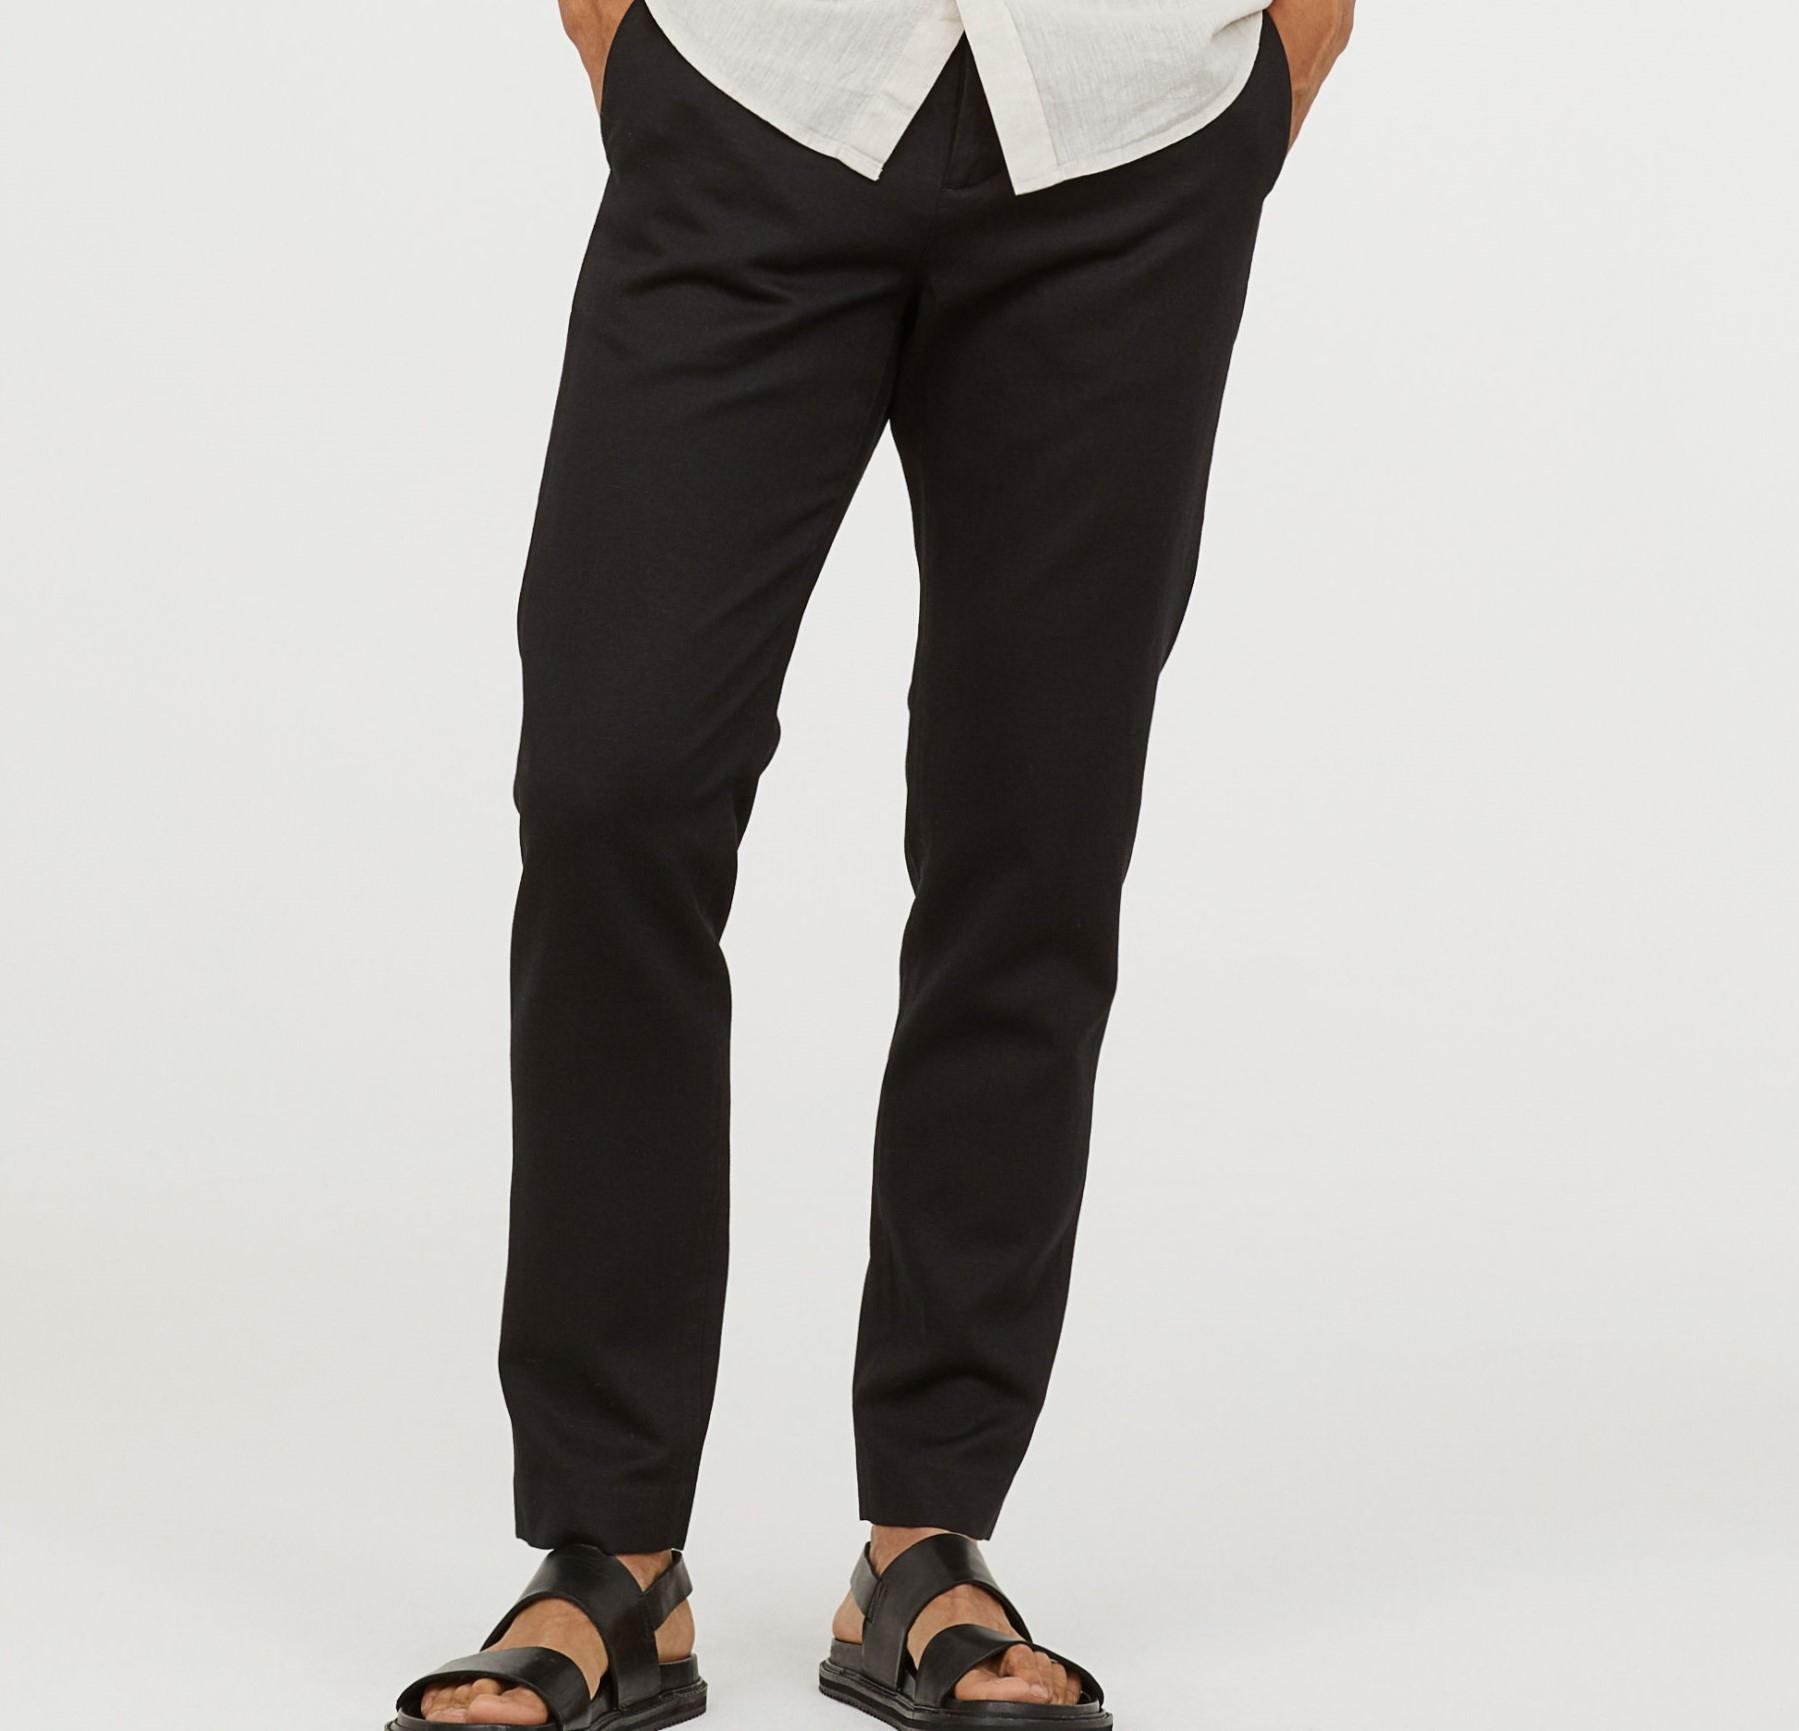 H&M RELAXED spodnie chino duże W30 REG M